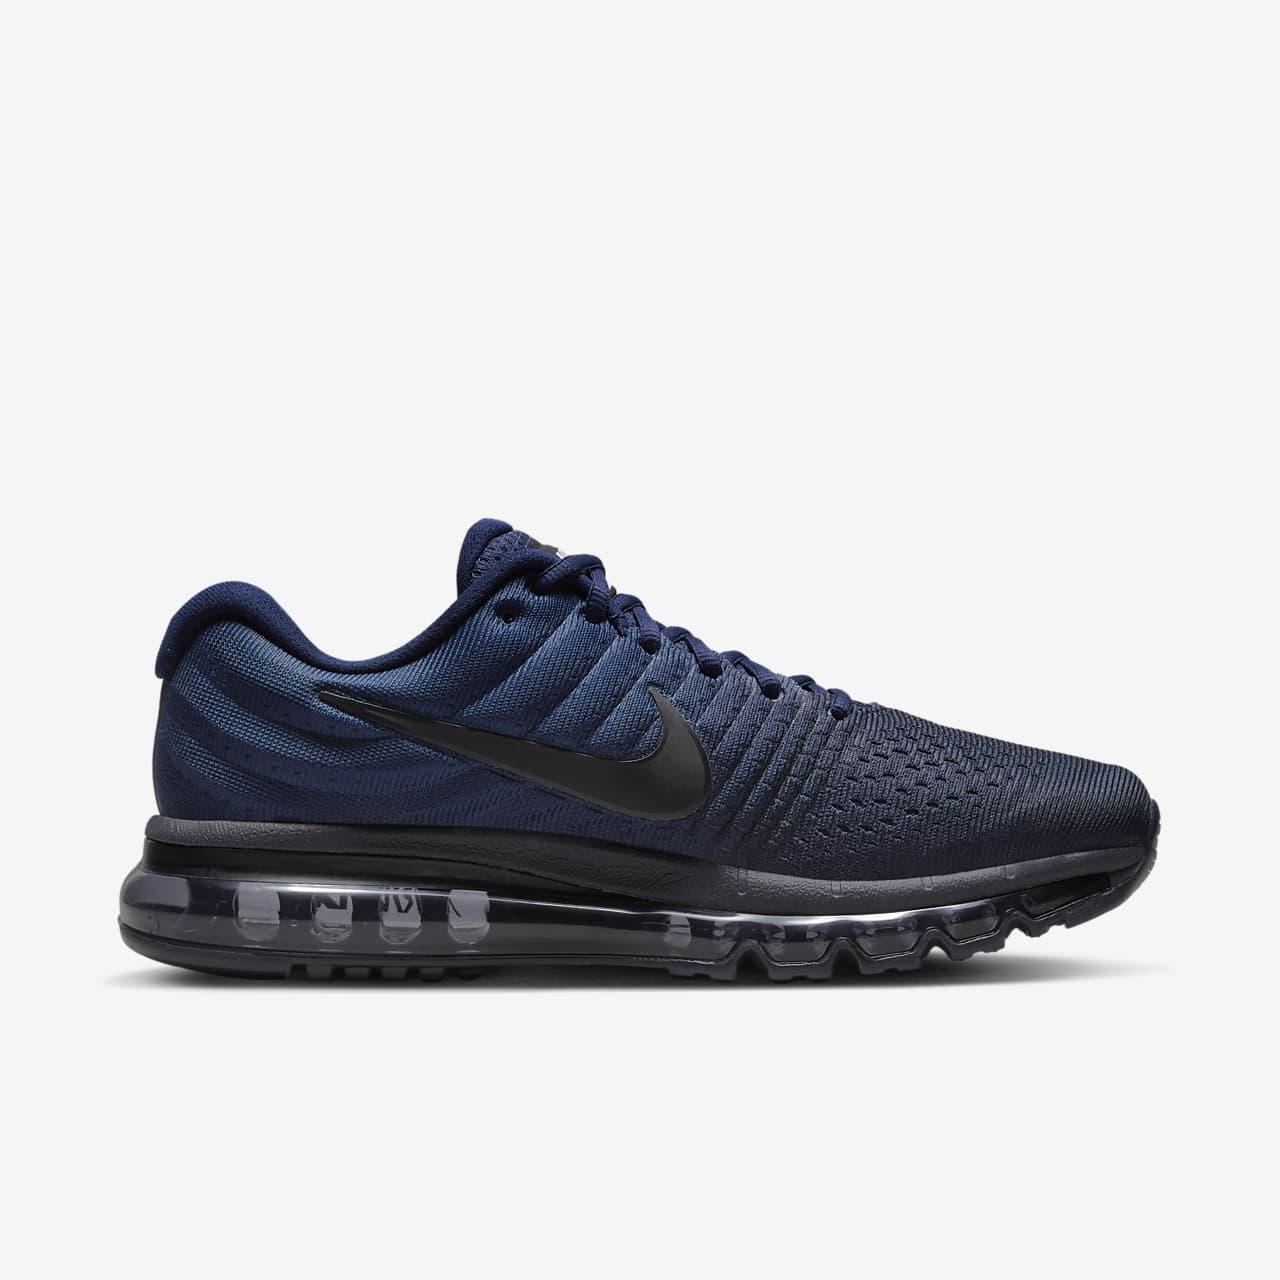 brand new e3e19 65ee9 ... Nike Air Max 2017 Men s Shoe